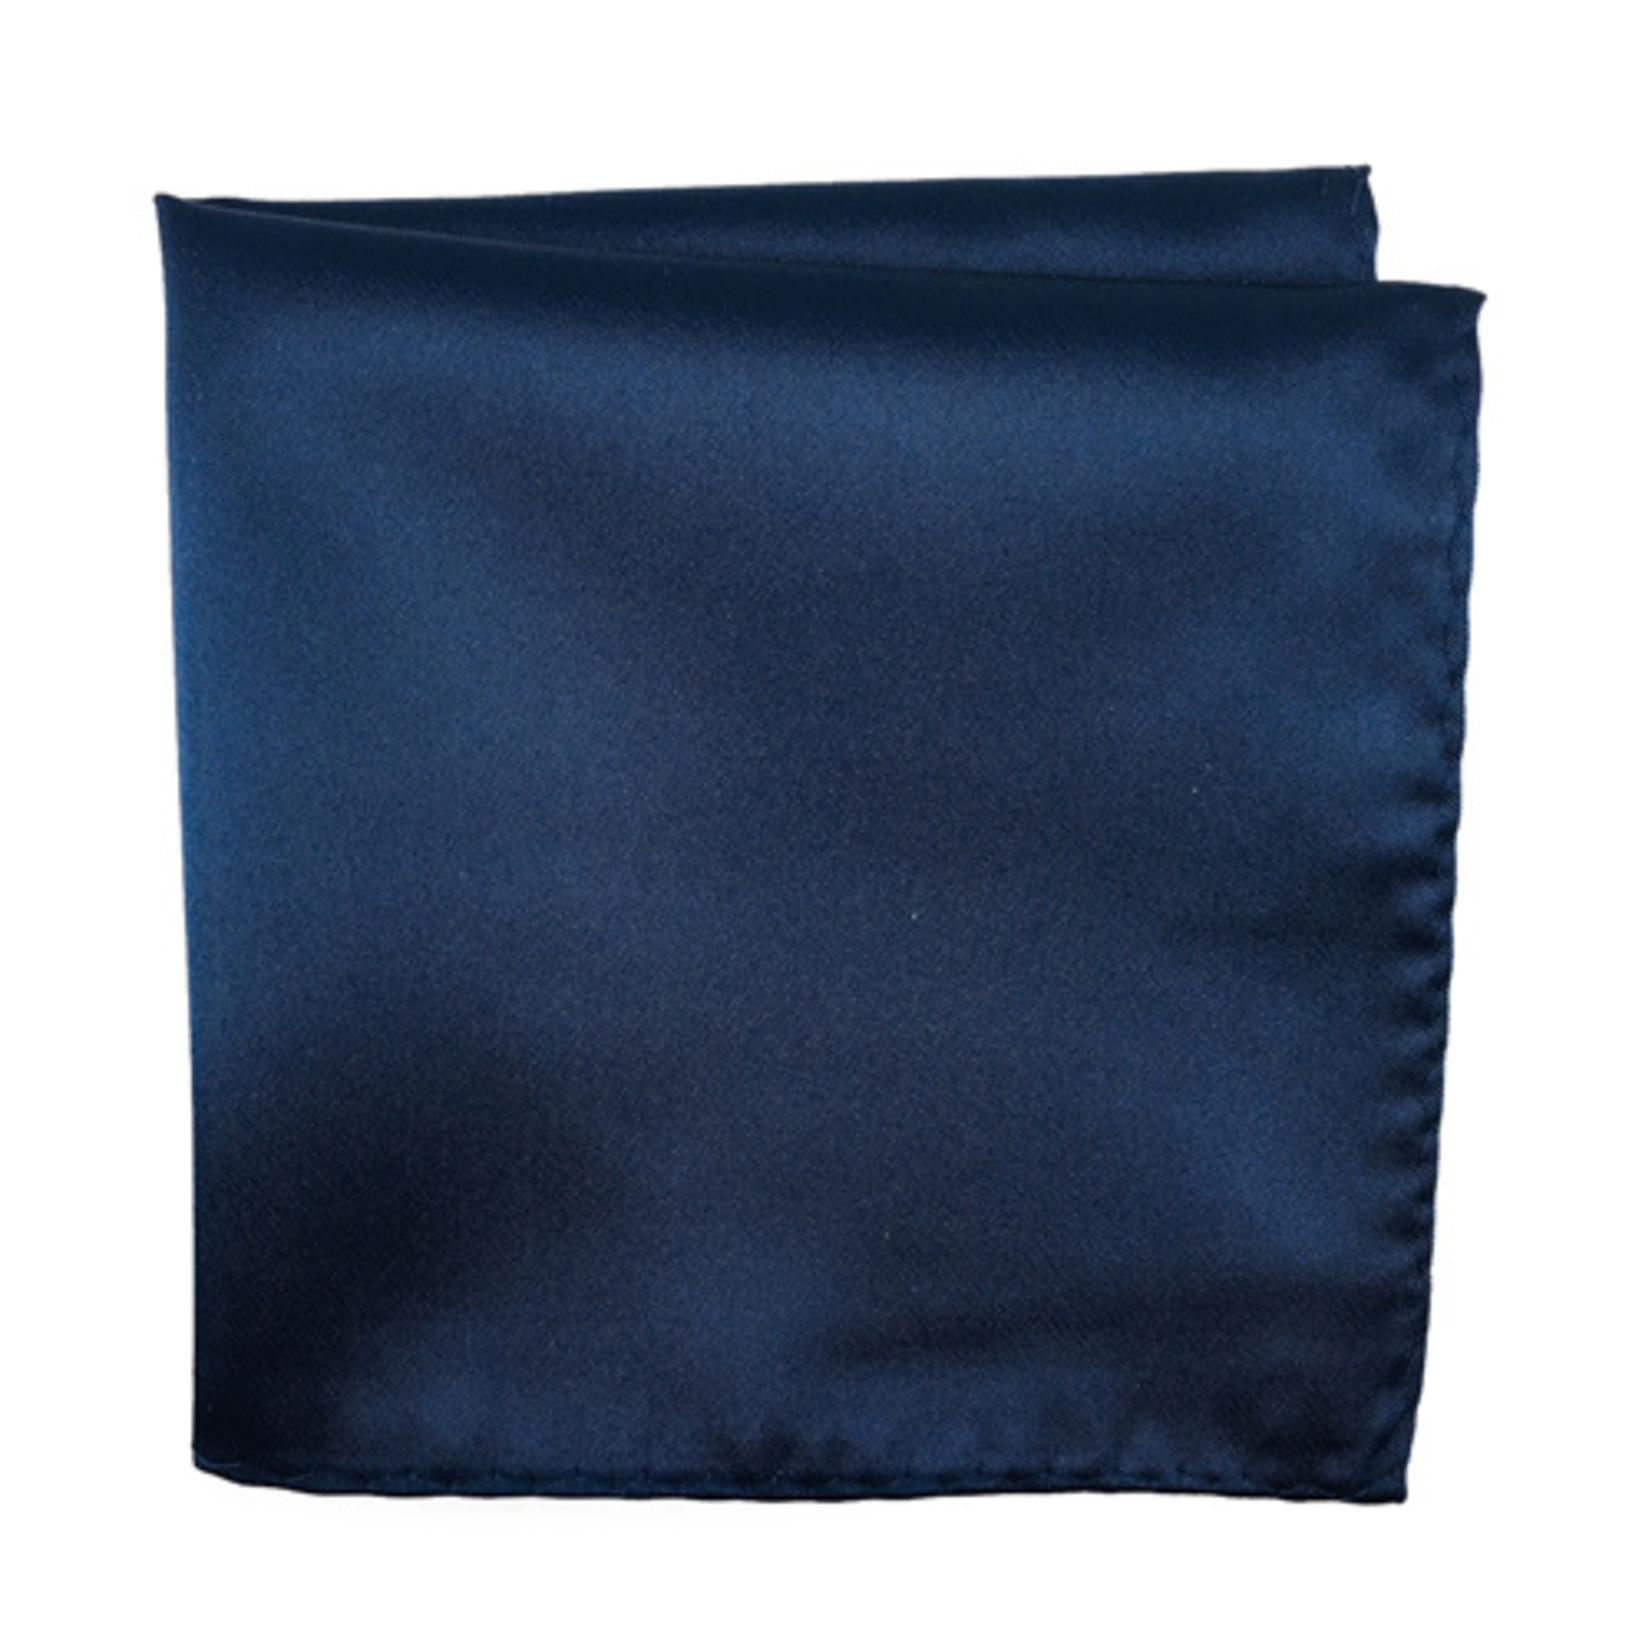 Knotz M100PSQ-2 Solid Navy Pocket Square